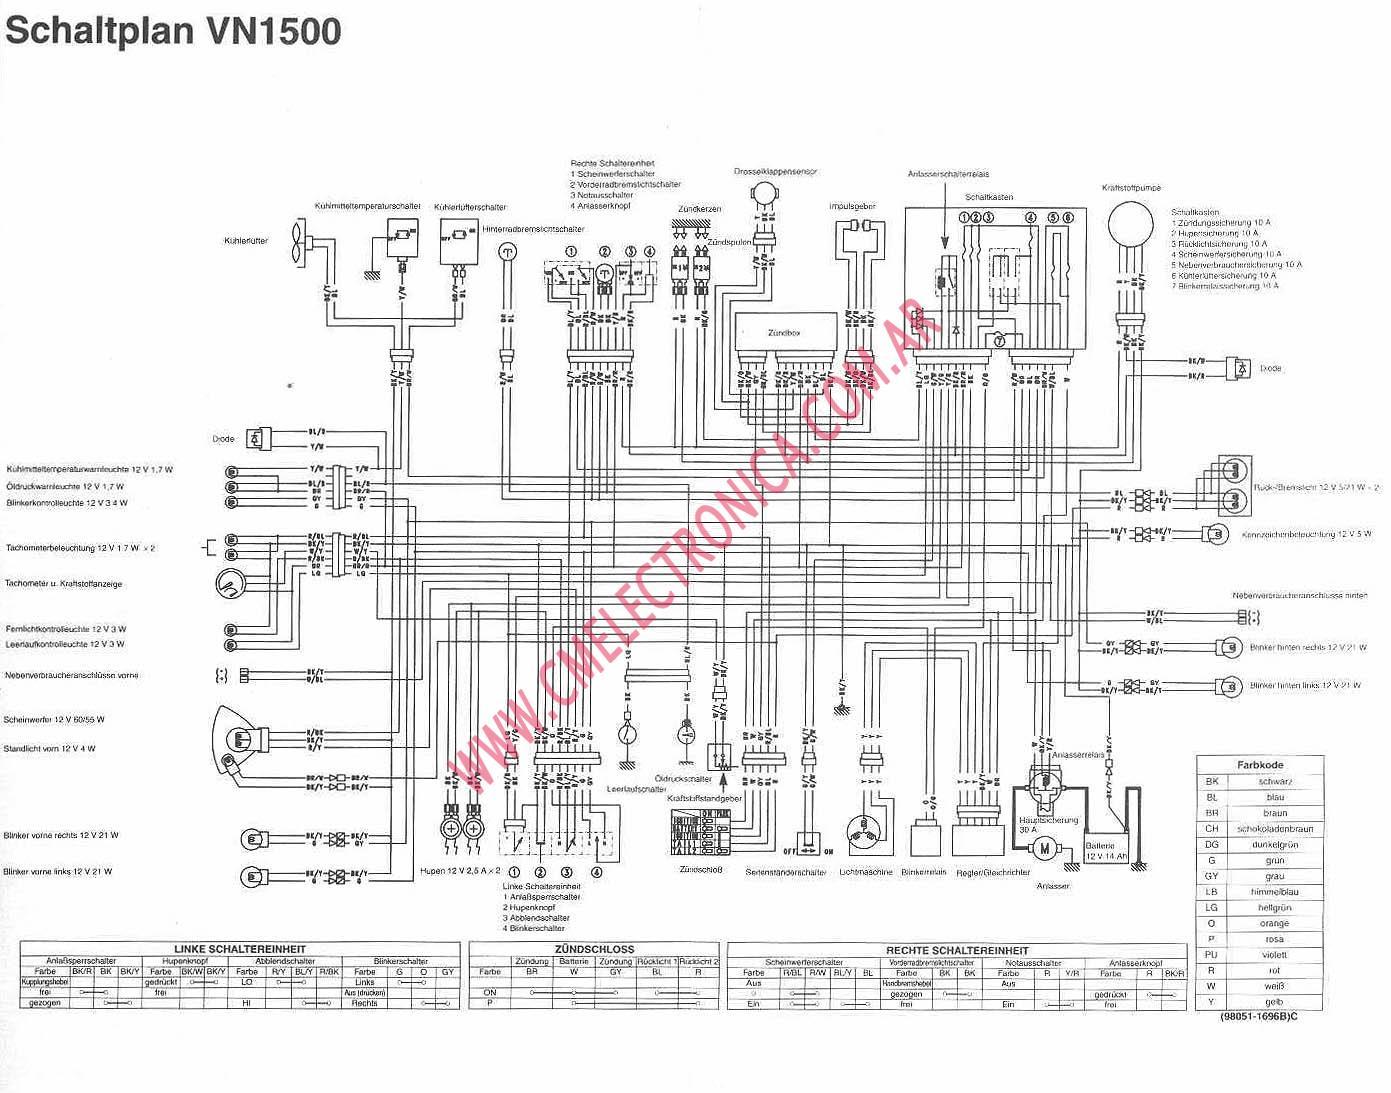 hight resolution of kawasaki zx12r wiring diagrams kawasaki free engine 1994 kawasaki vulcan 1500 wiring diagram 1997 kawasaki vulcan